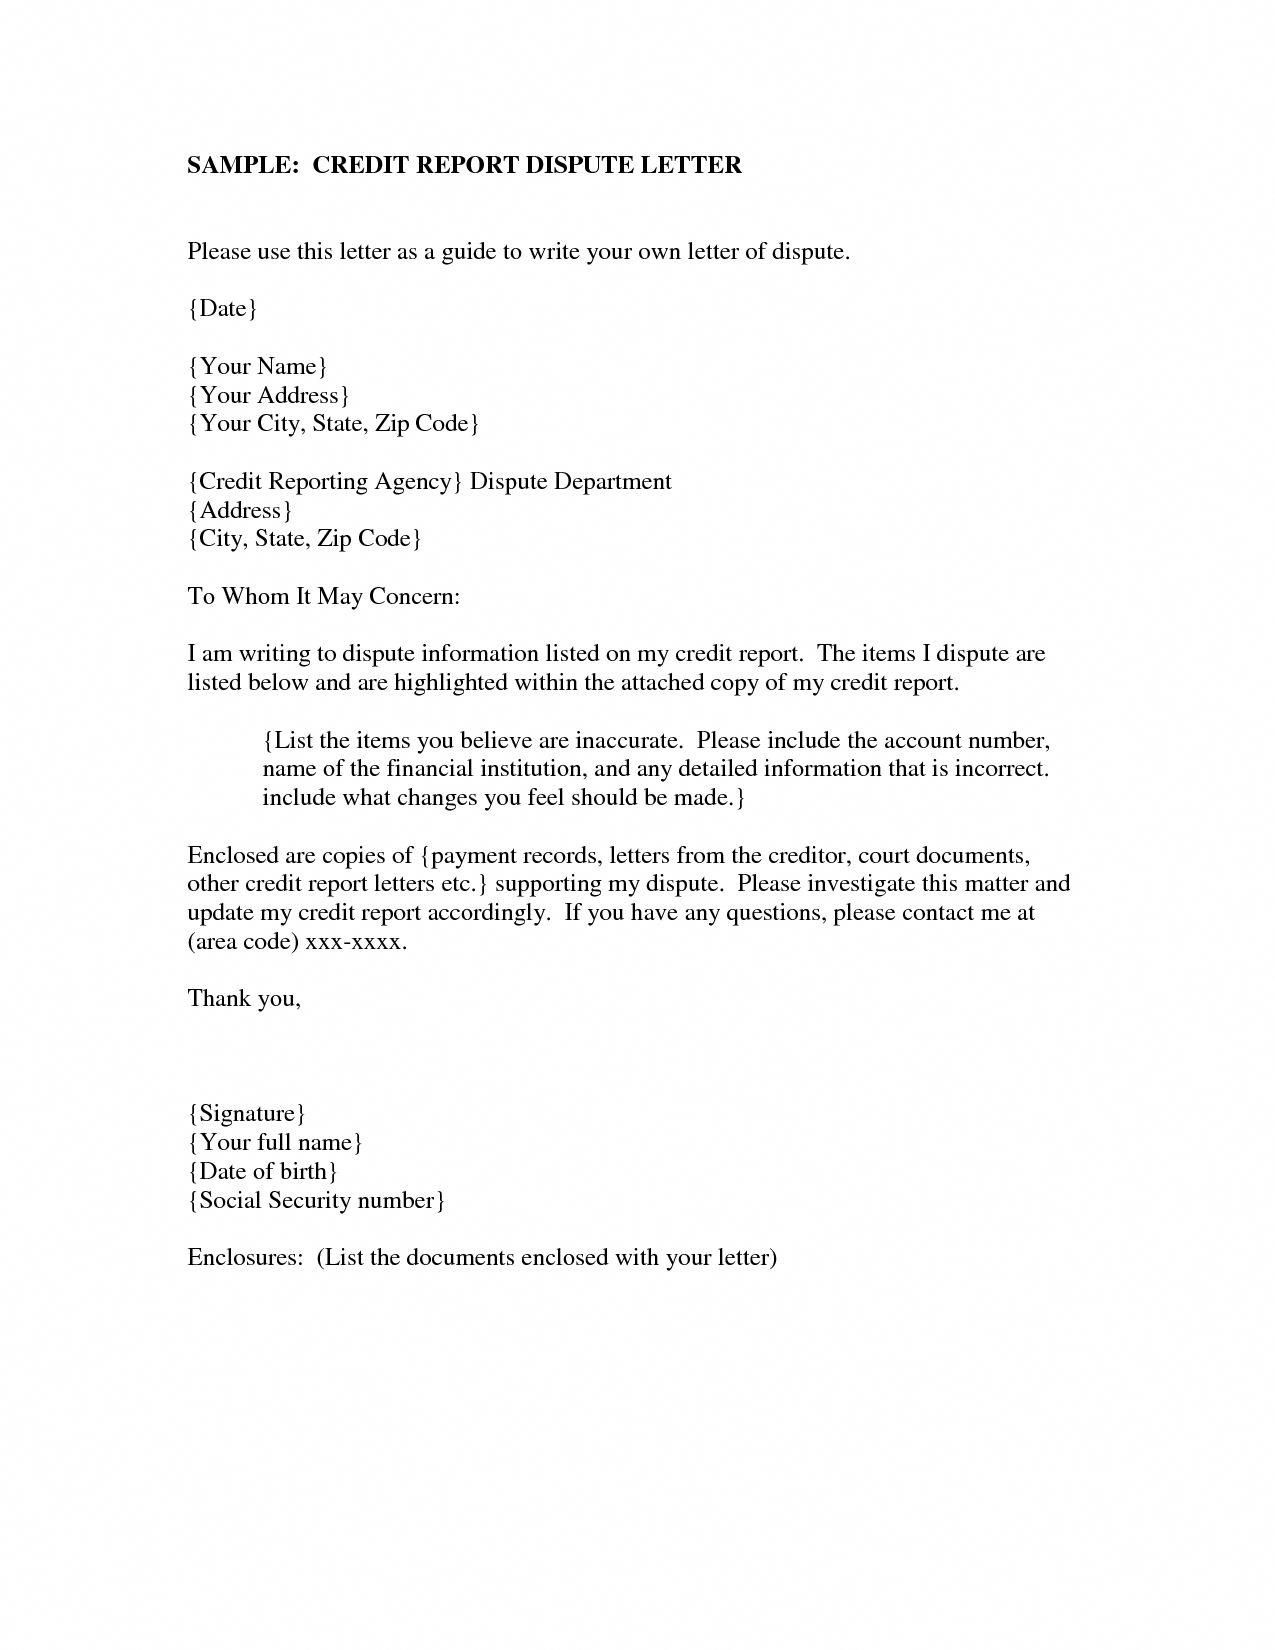 Pin by Trinidad Cruz on credit dispute letters to repair